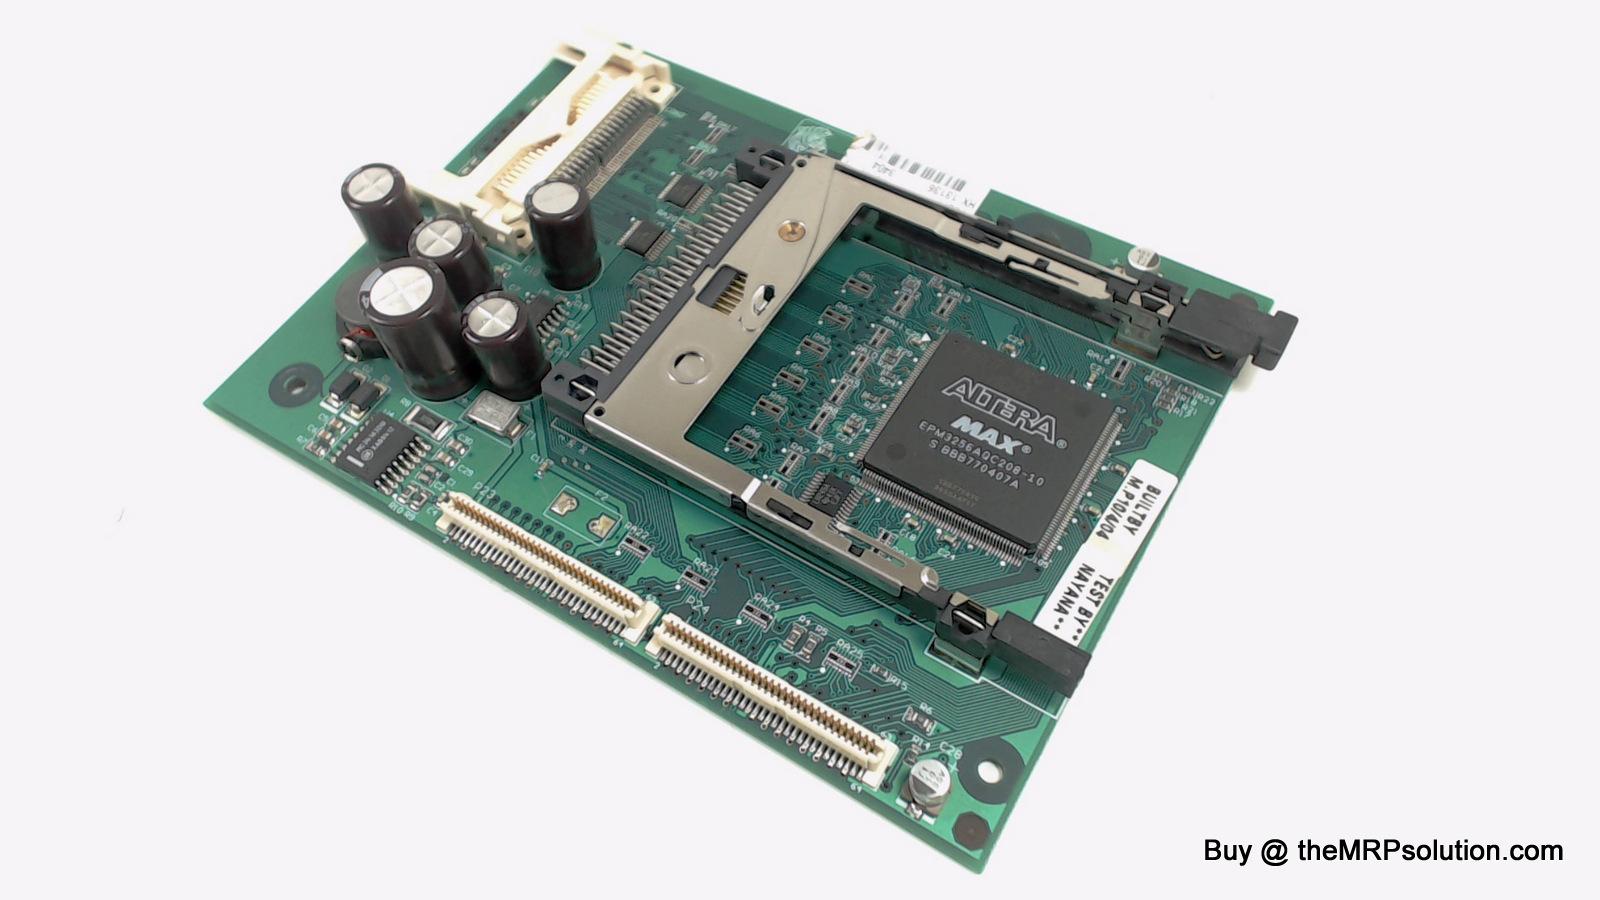 ZEBRA 79077 PCMCIA BOARD, Z4M PLUS Refurbished